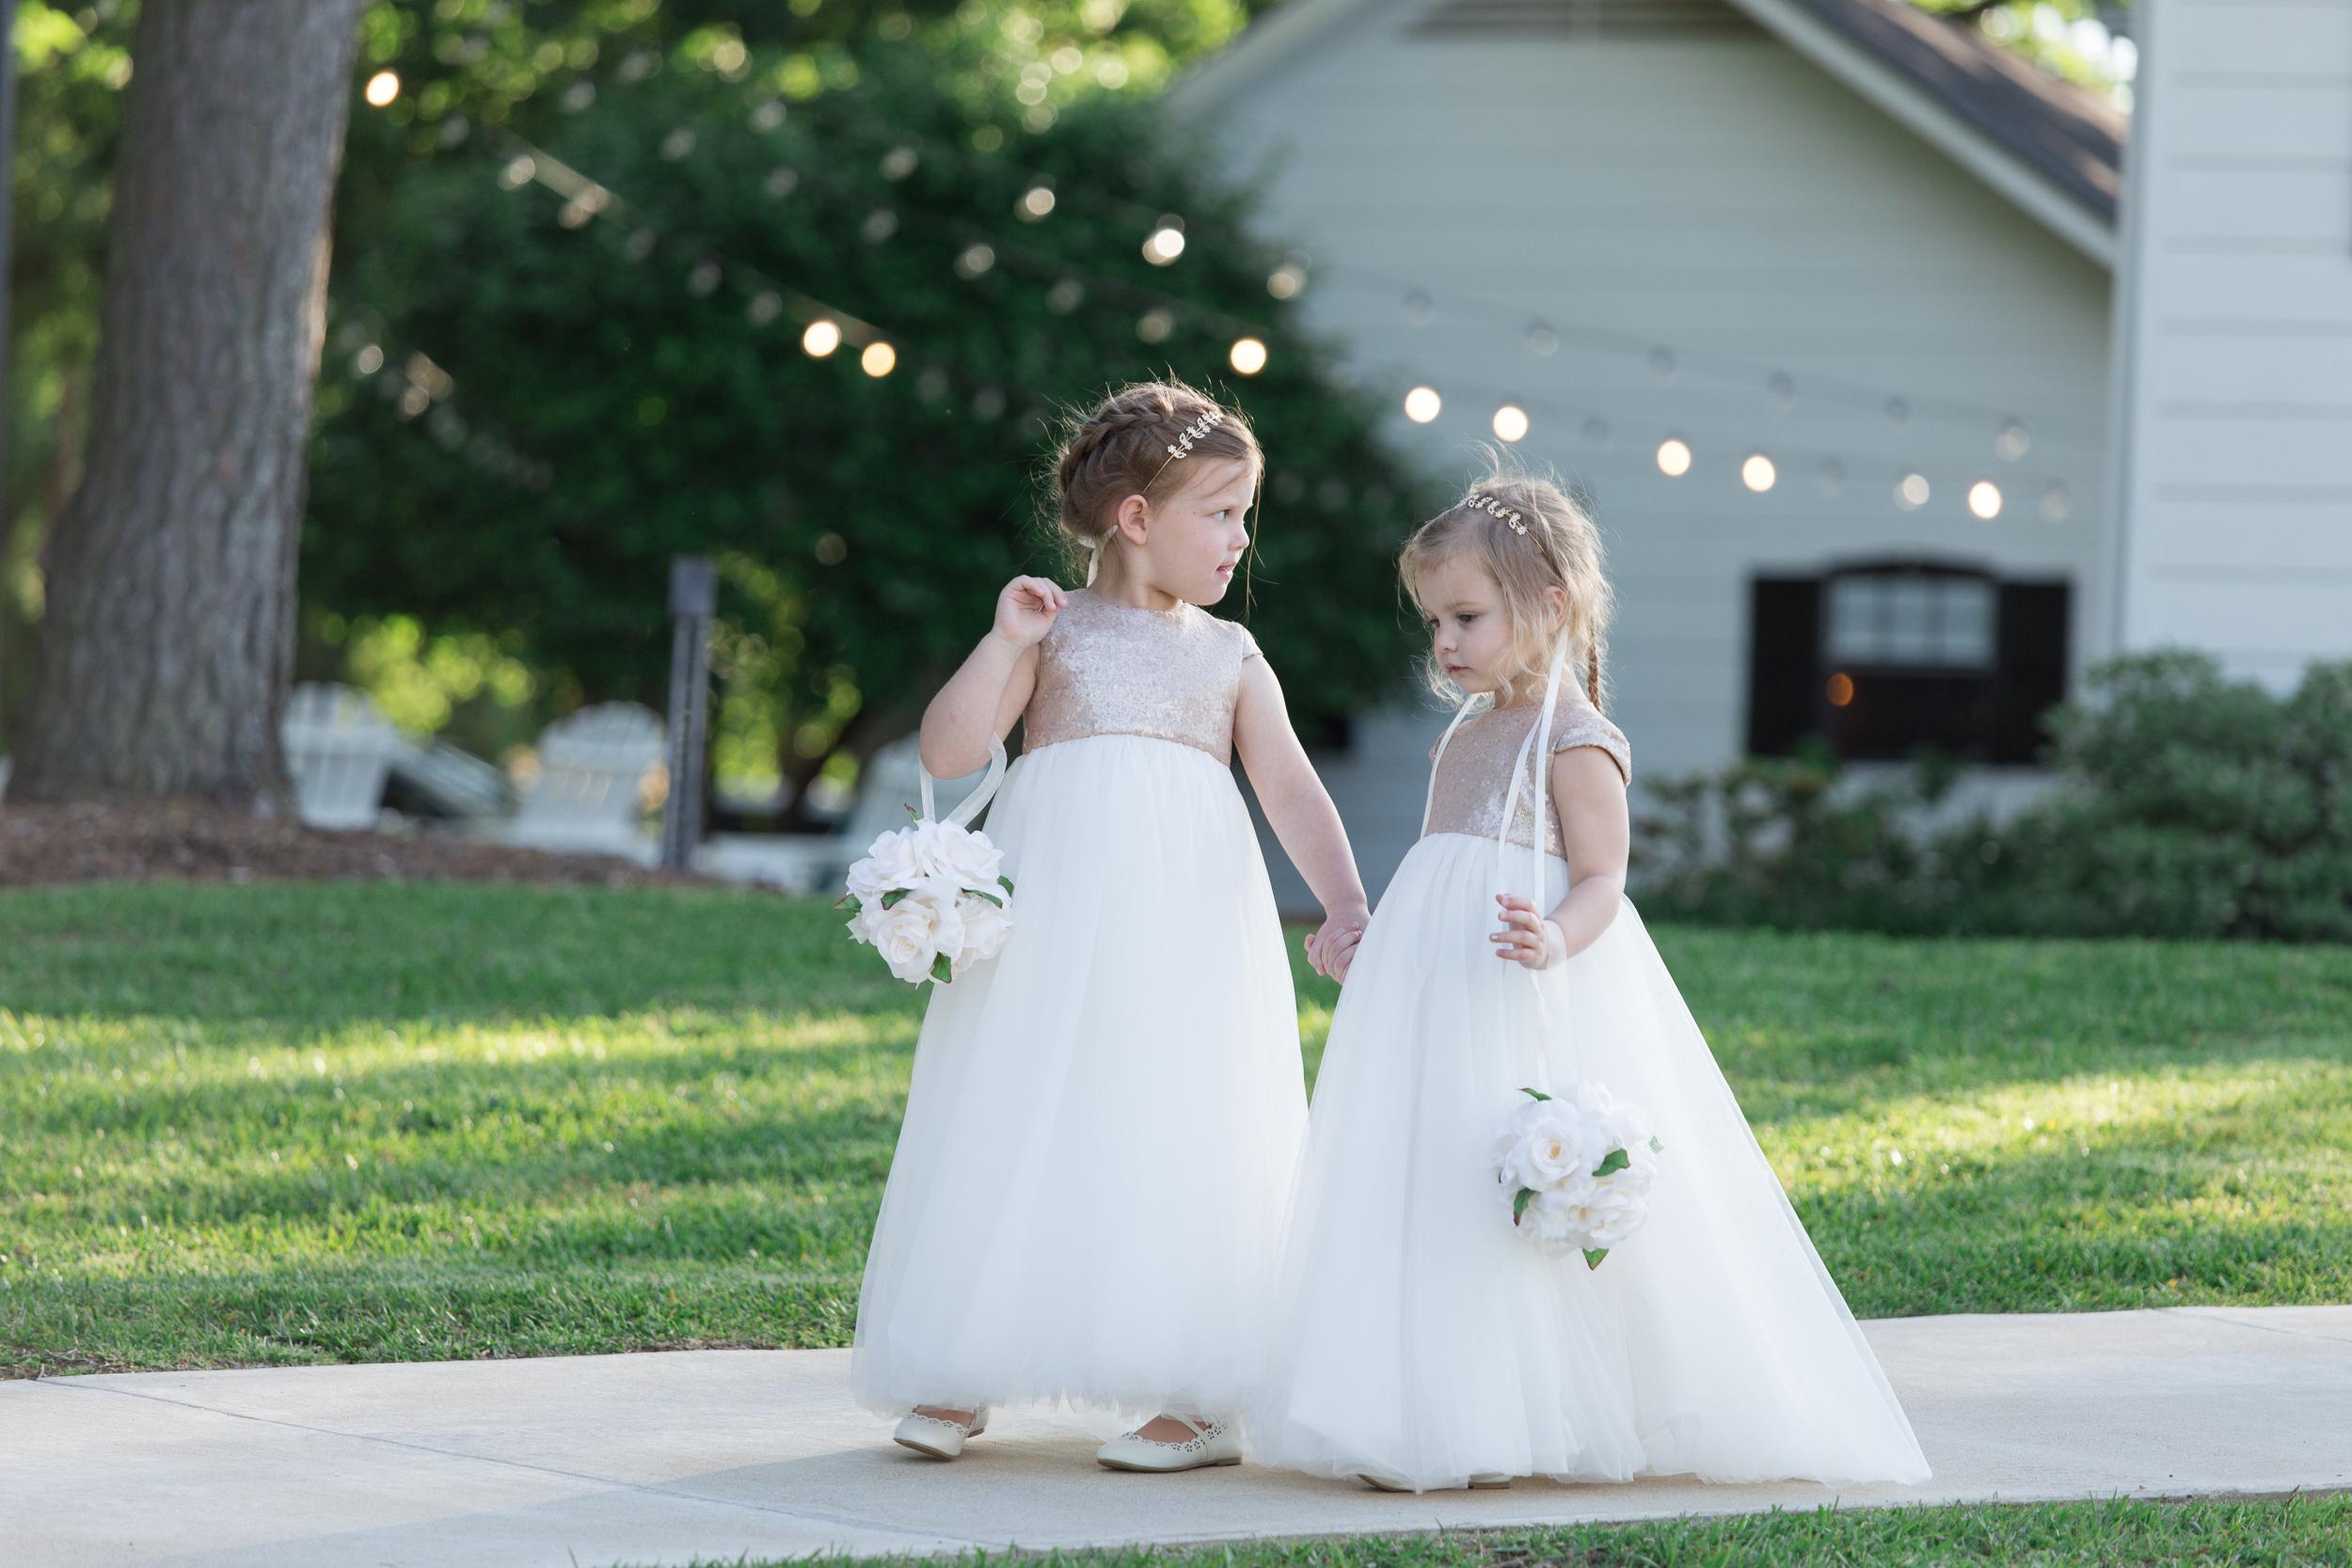 Zihlman-East TX Wedding_Kelsie Hendricks Photography_The Folmar Tyler Texas-32.jpg